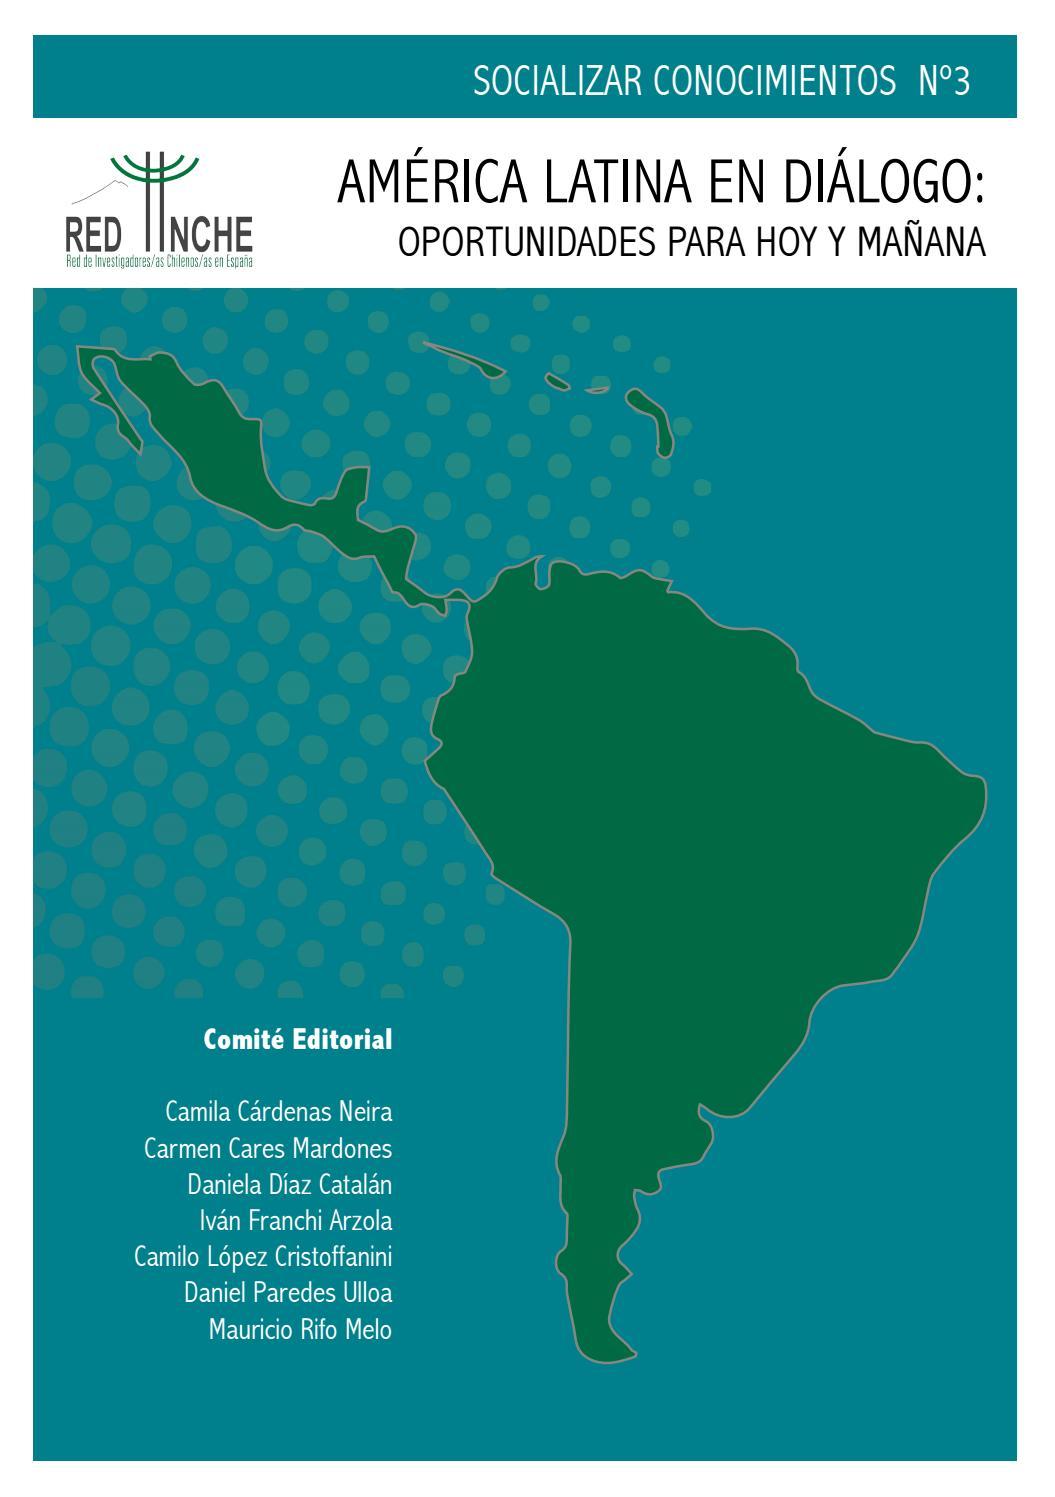 Socializar conocimientos número 3 (Red INCHE) by Red INCHE - issuu